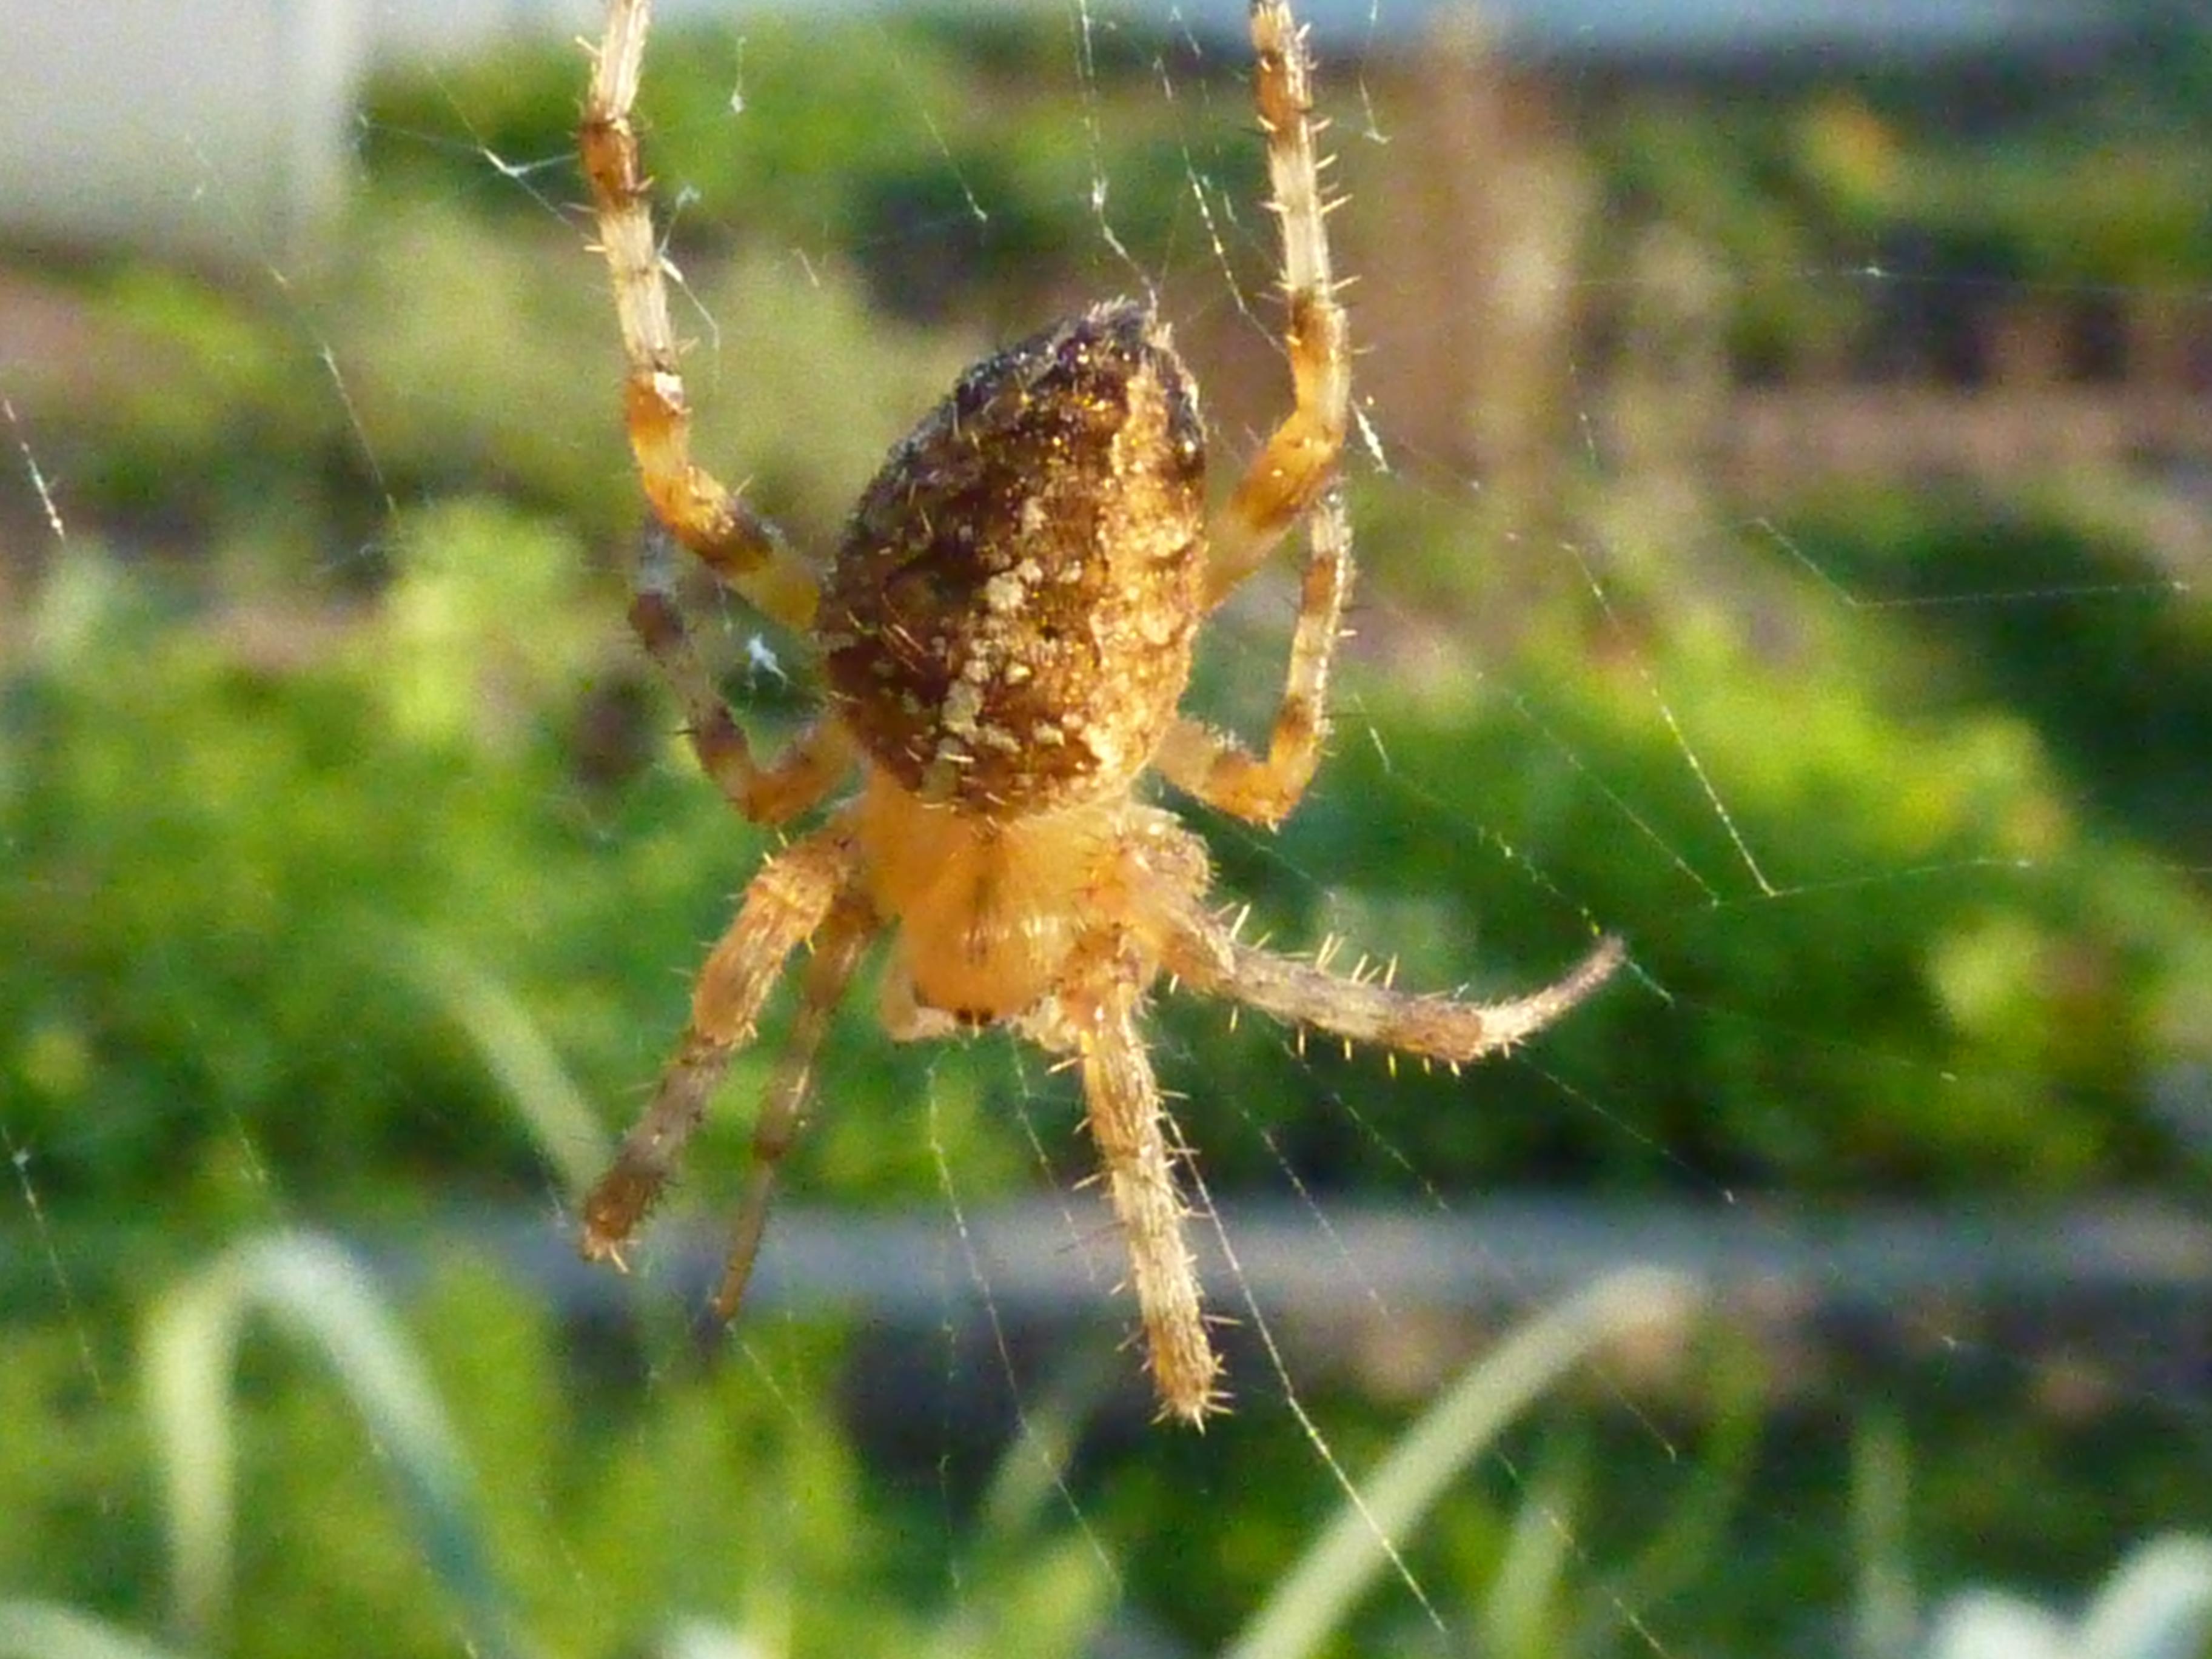 Crab spider preying bumble bee garden spiders spiders flower spiders - Arachnophobes Beware